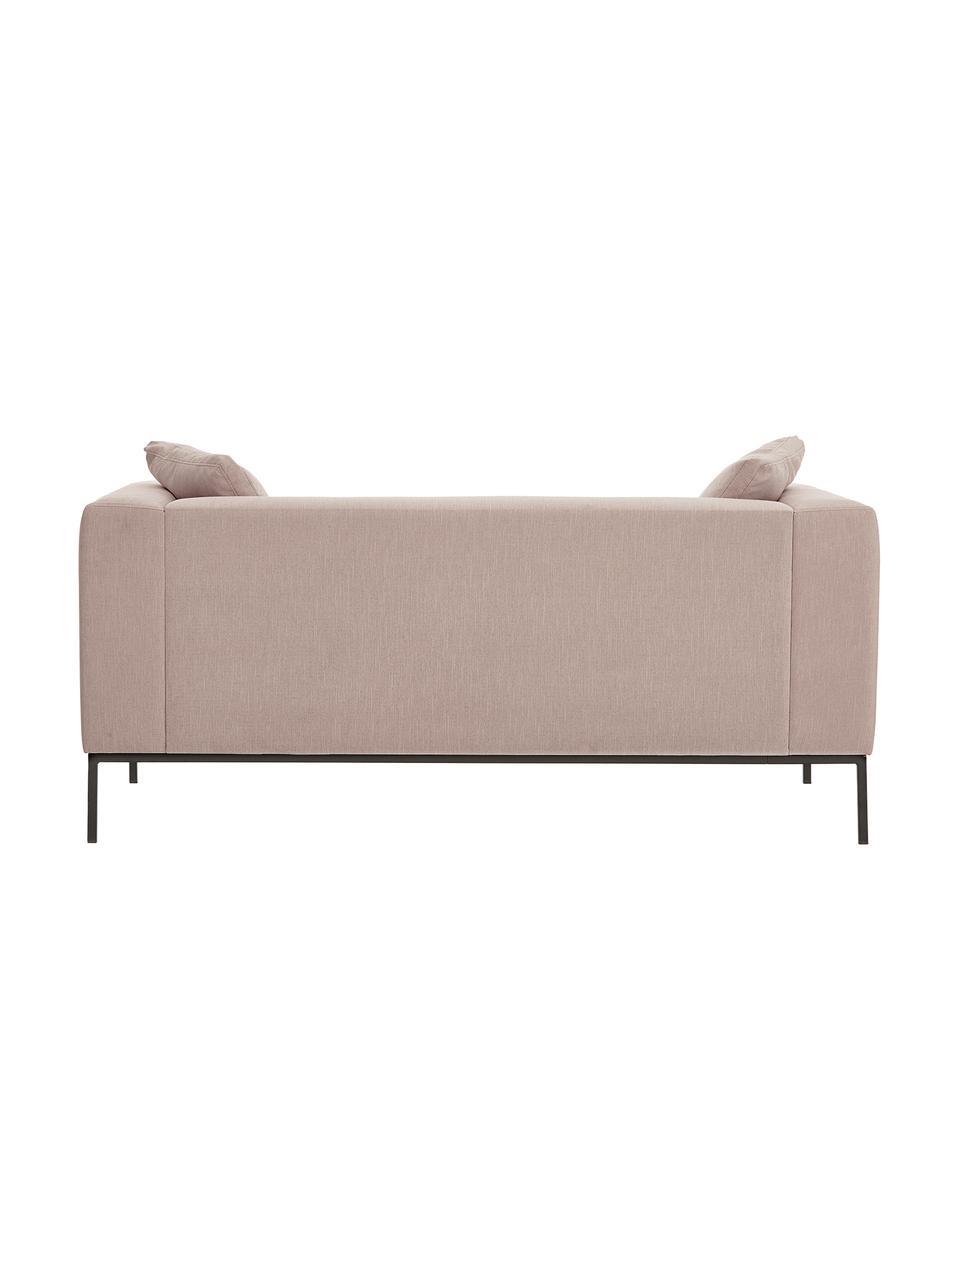 Sofa Carrie (2-Sitzer) in Alrosa mit Metall-Füßen, Bezug: Polyester 50.000 Scheuert, Gestell: Spanholz, Hartfaserplatte, Füße: Metall, lackiert, Webstoff Altrosa, B 176 x T 86 cm